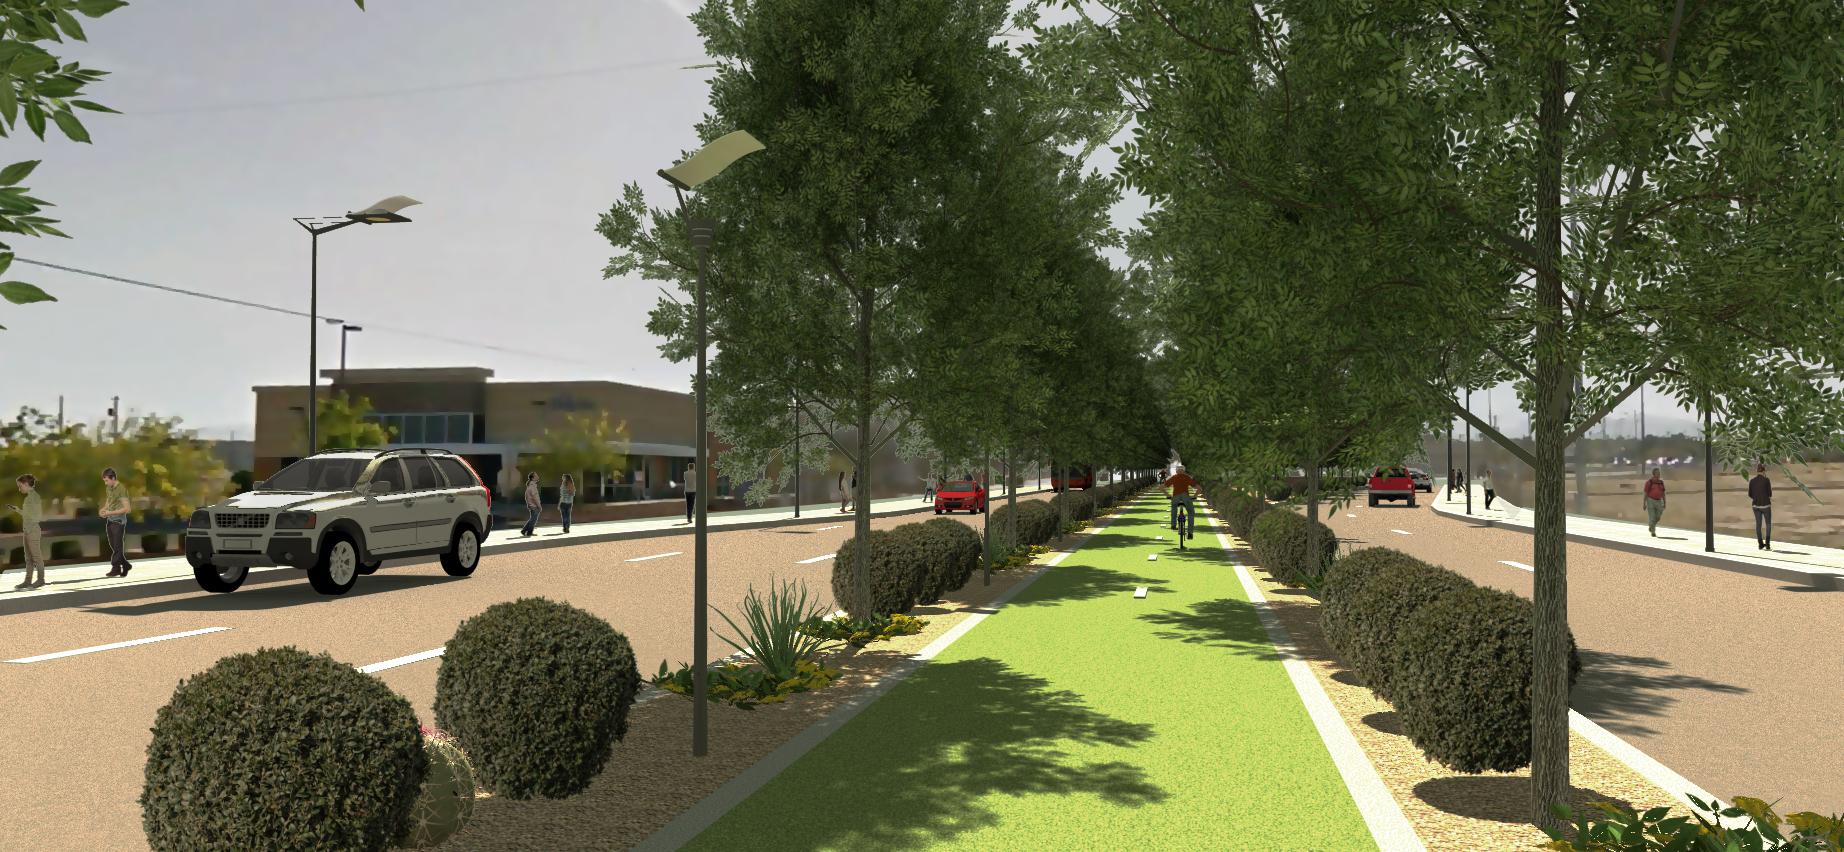 CNLV-complete-streets-lk mead las vegas blvd 05